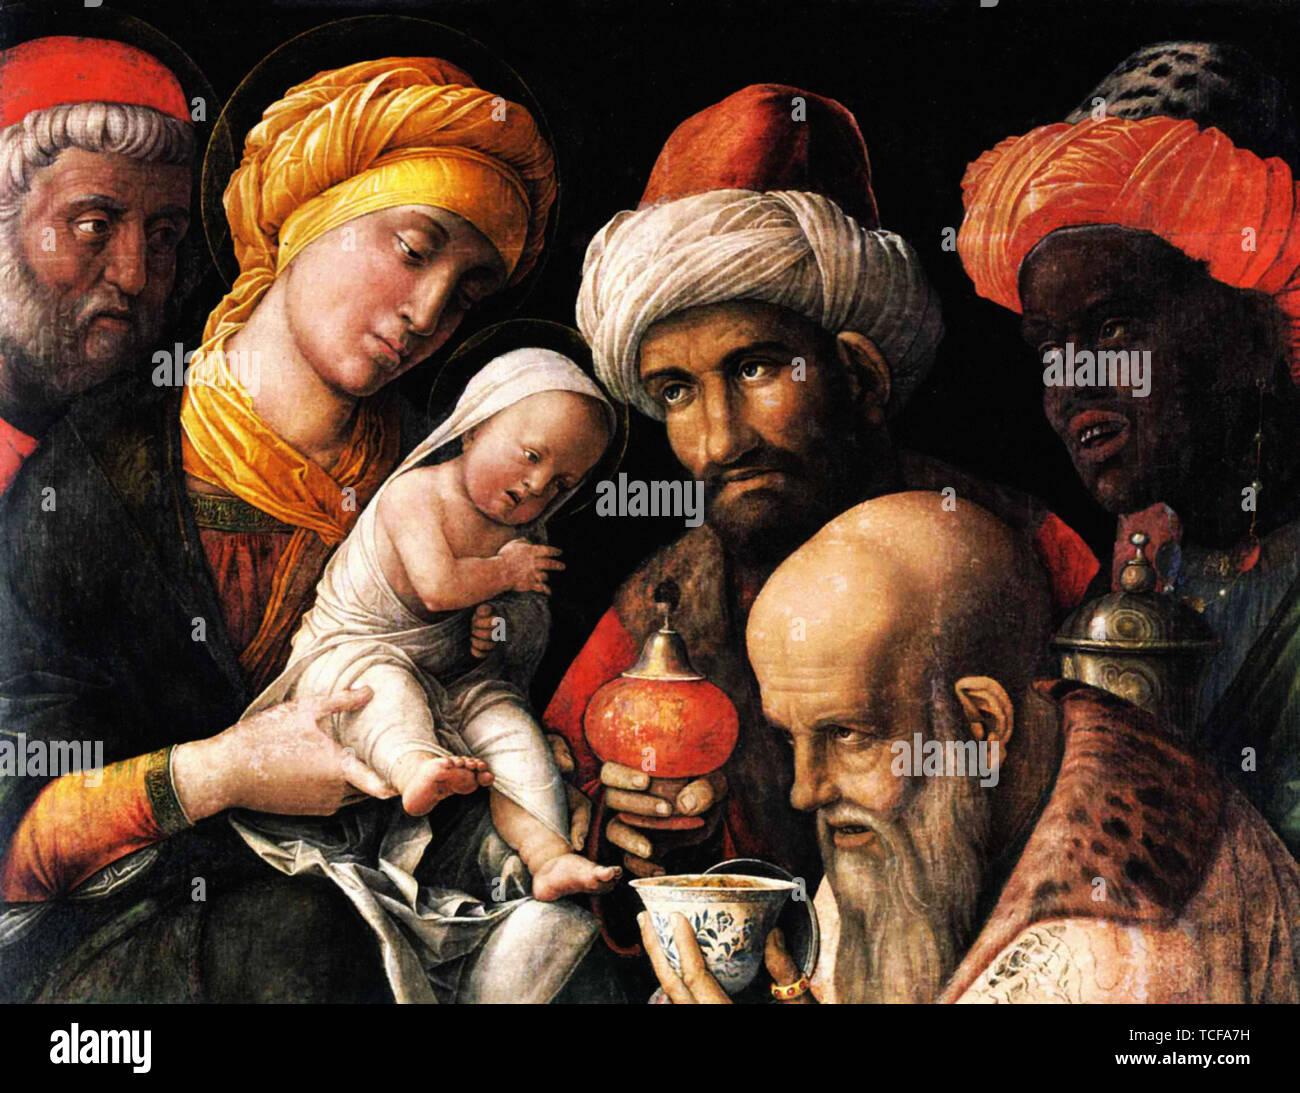 Andrea Mantegna - Adoration Magi 1500 - Stock Image